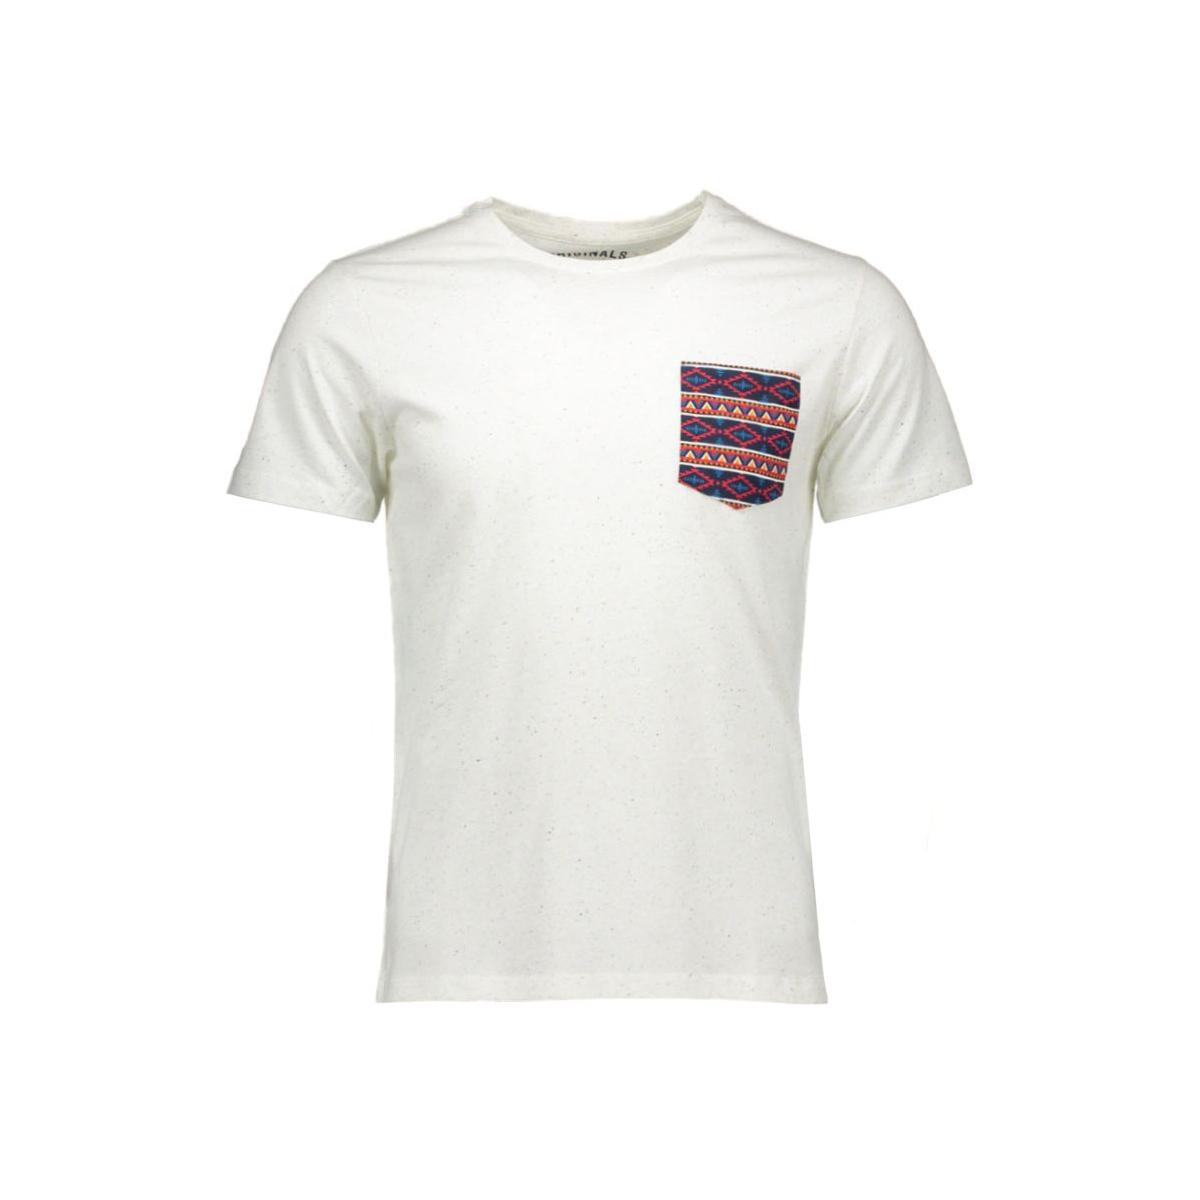 jornew bob tee 12078814 jack & jones t-shirt cloud dancer